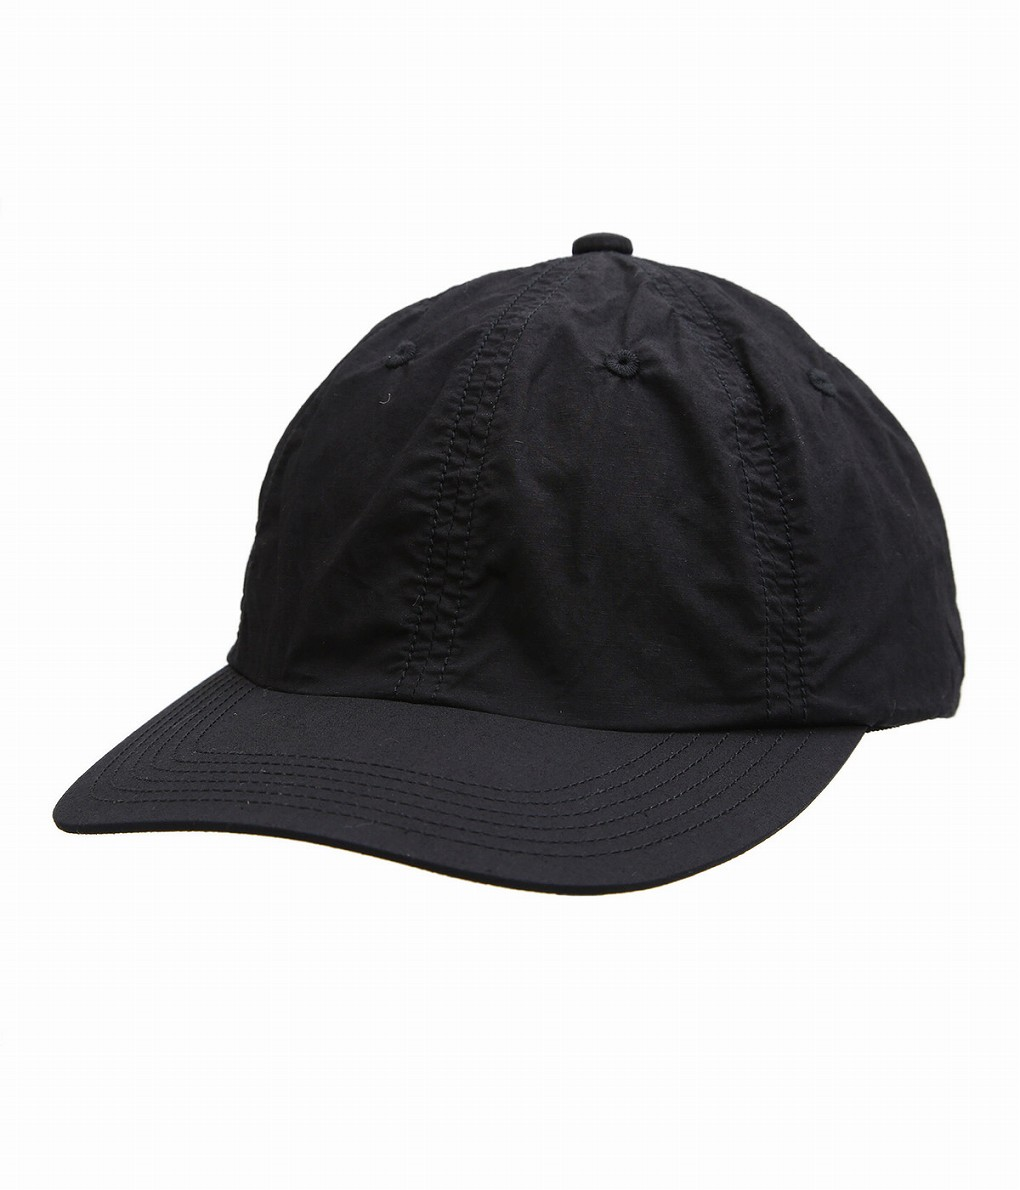 KIJIMA TAKAYUKI / キジマ タカユキ : 6 Punel Cap : シックスパネル ロクパネルキャップ メンズ キャップ 帽子 : 201220 【RIP】【BJB】